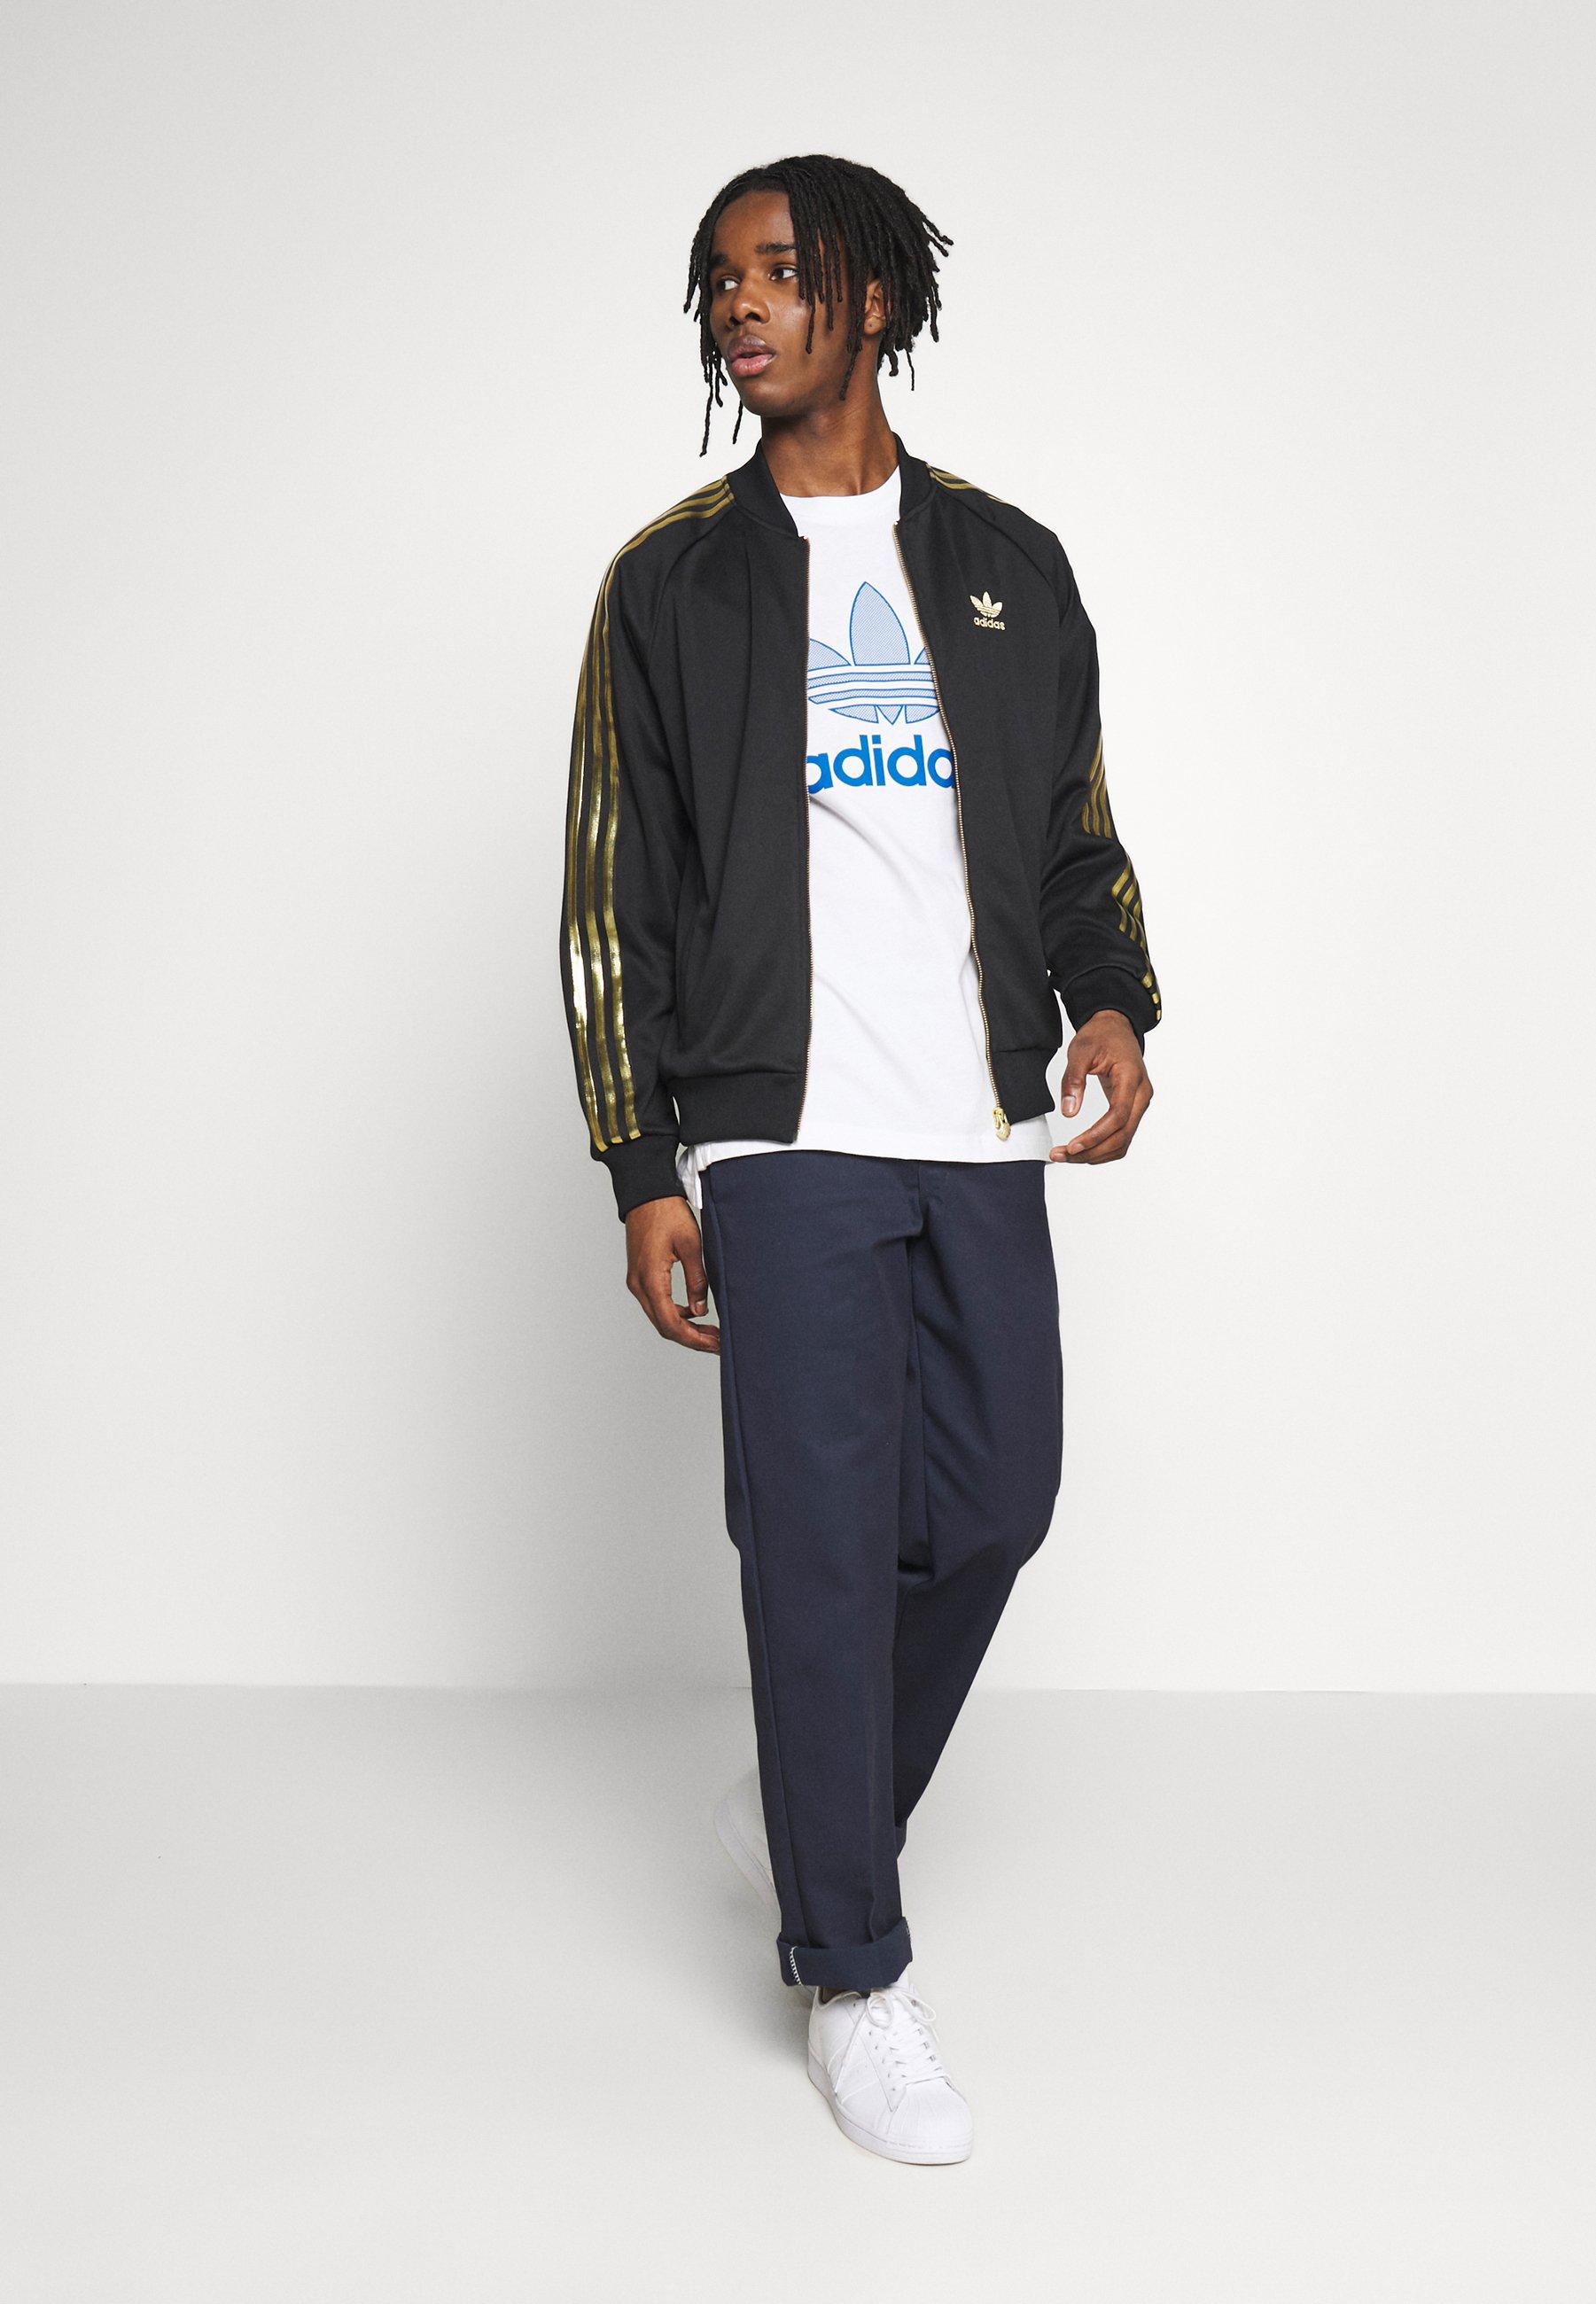 Adidas SST 24 Originals Jacke blackgold metallic ab 79,50